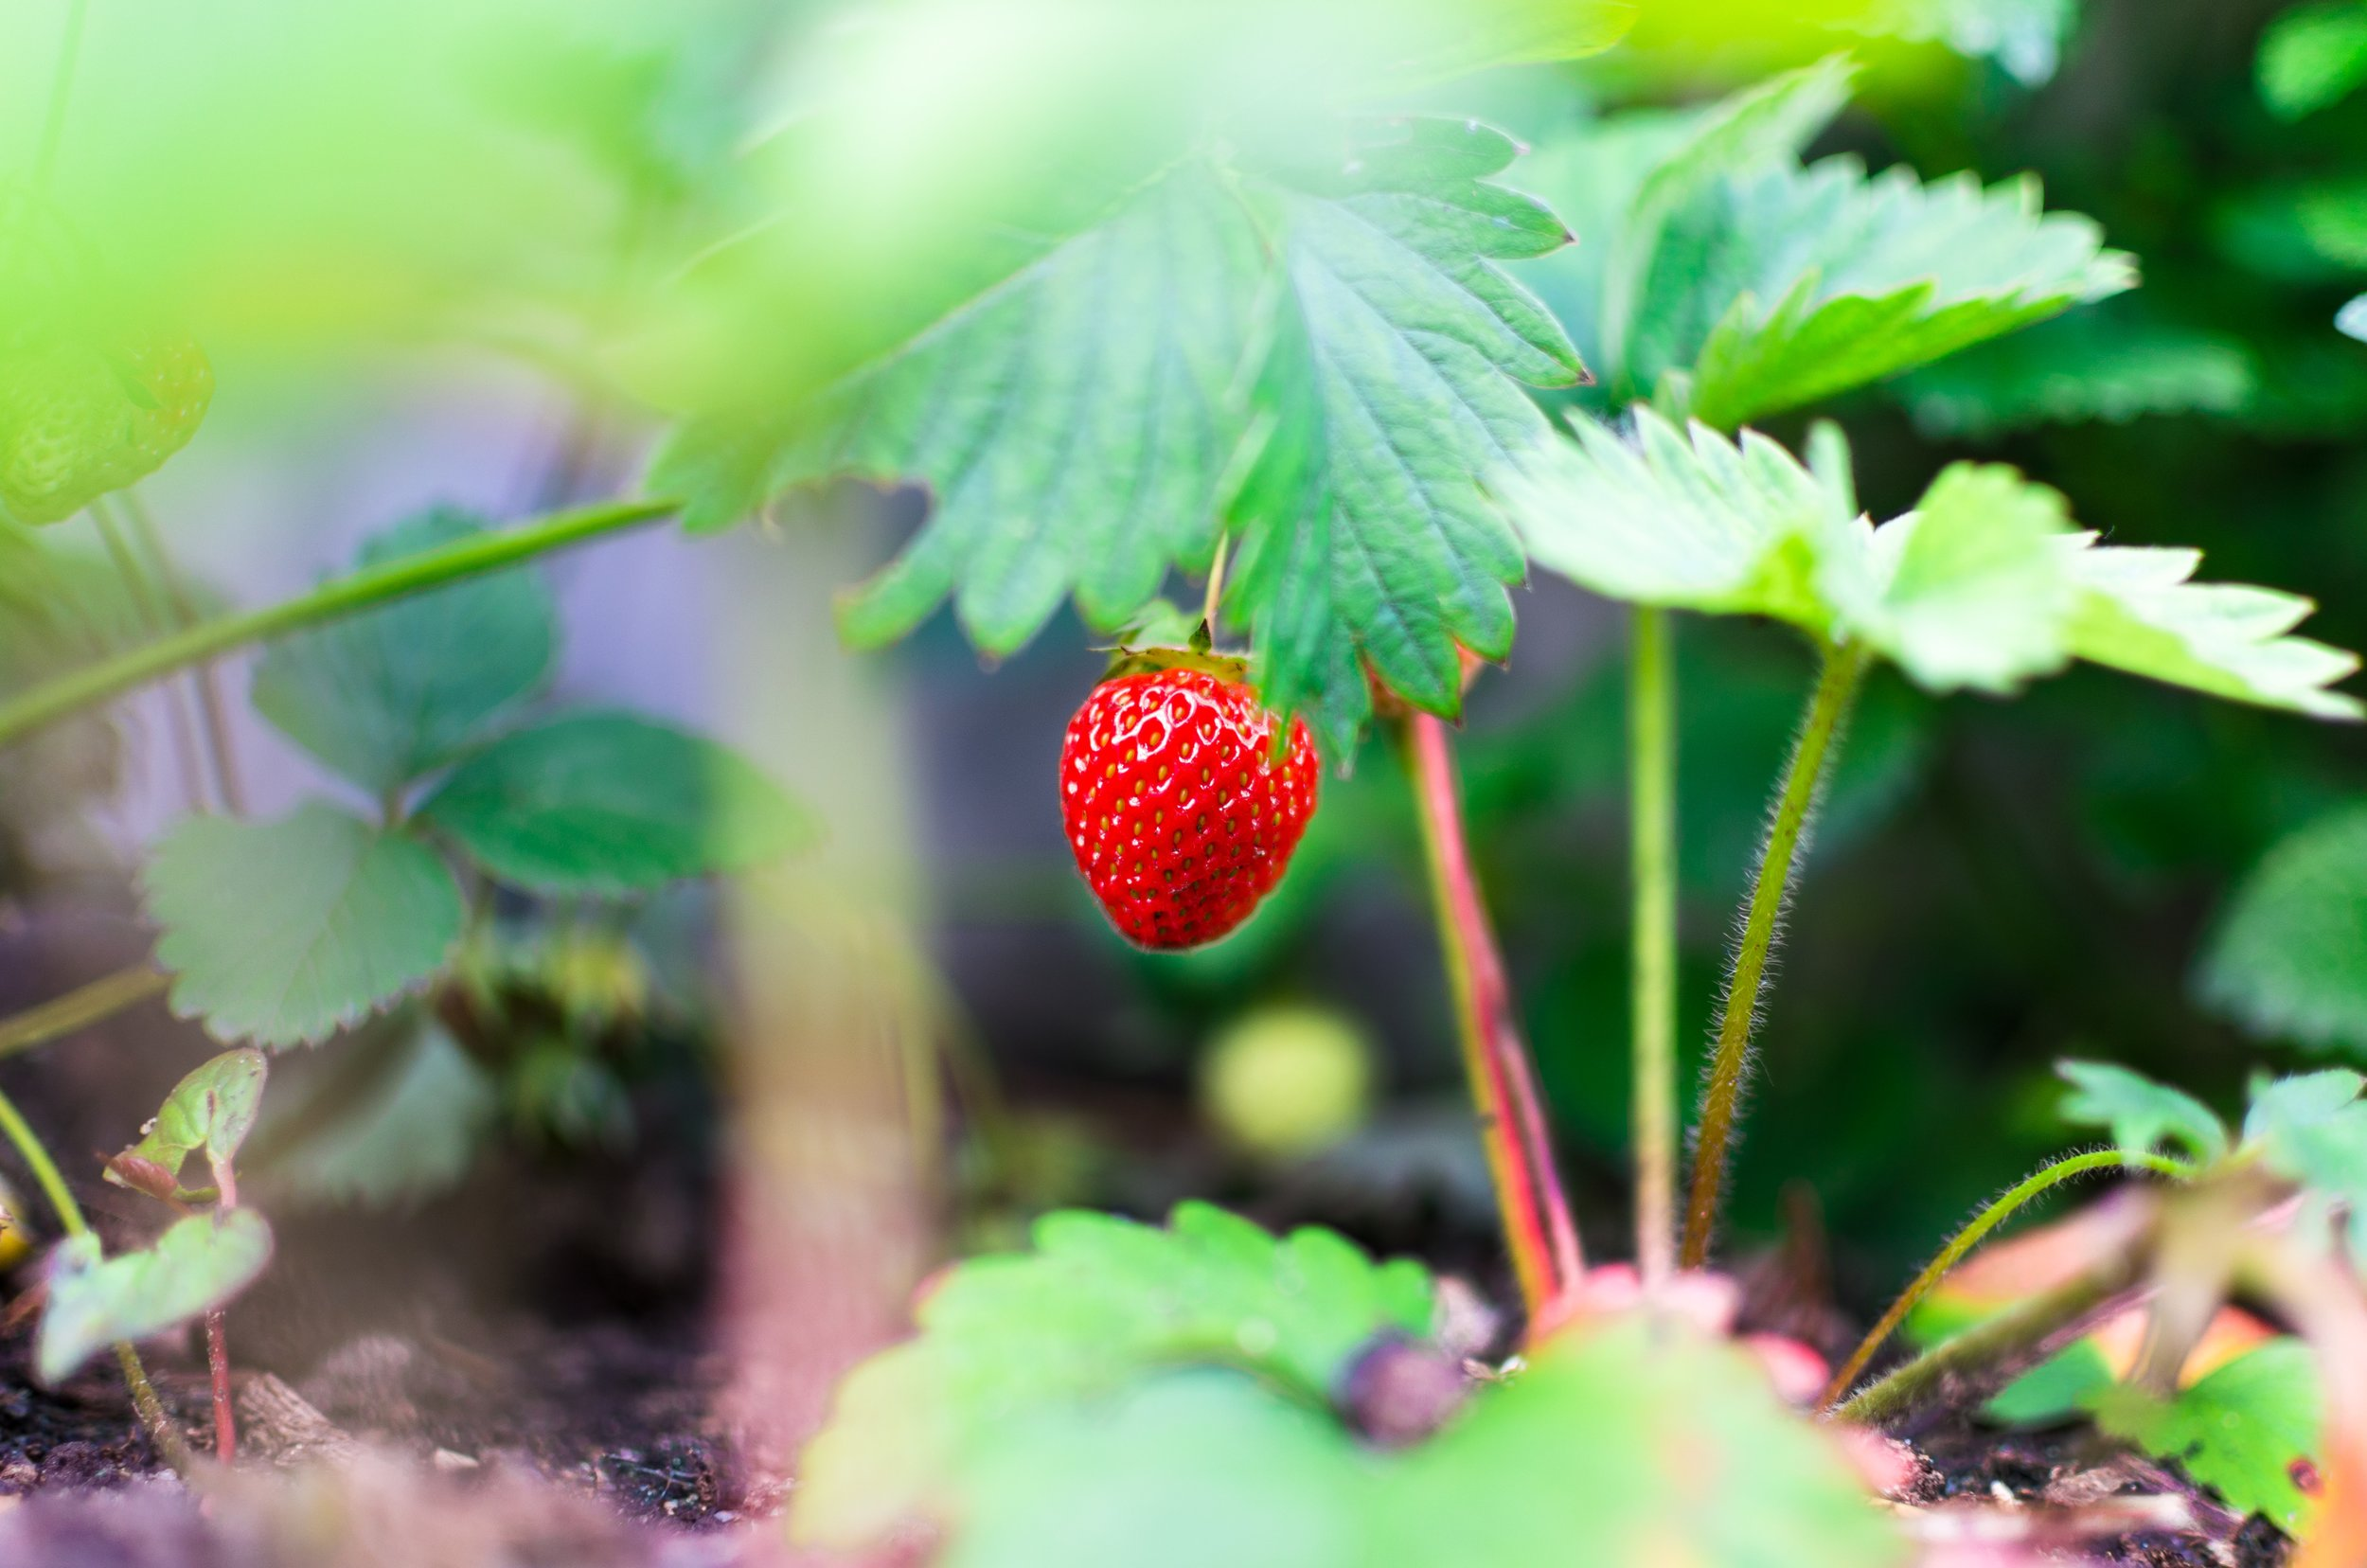 agriculture-blur-color-298694.jpg